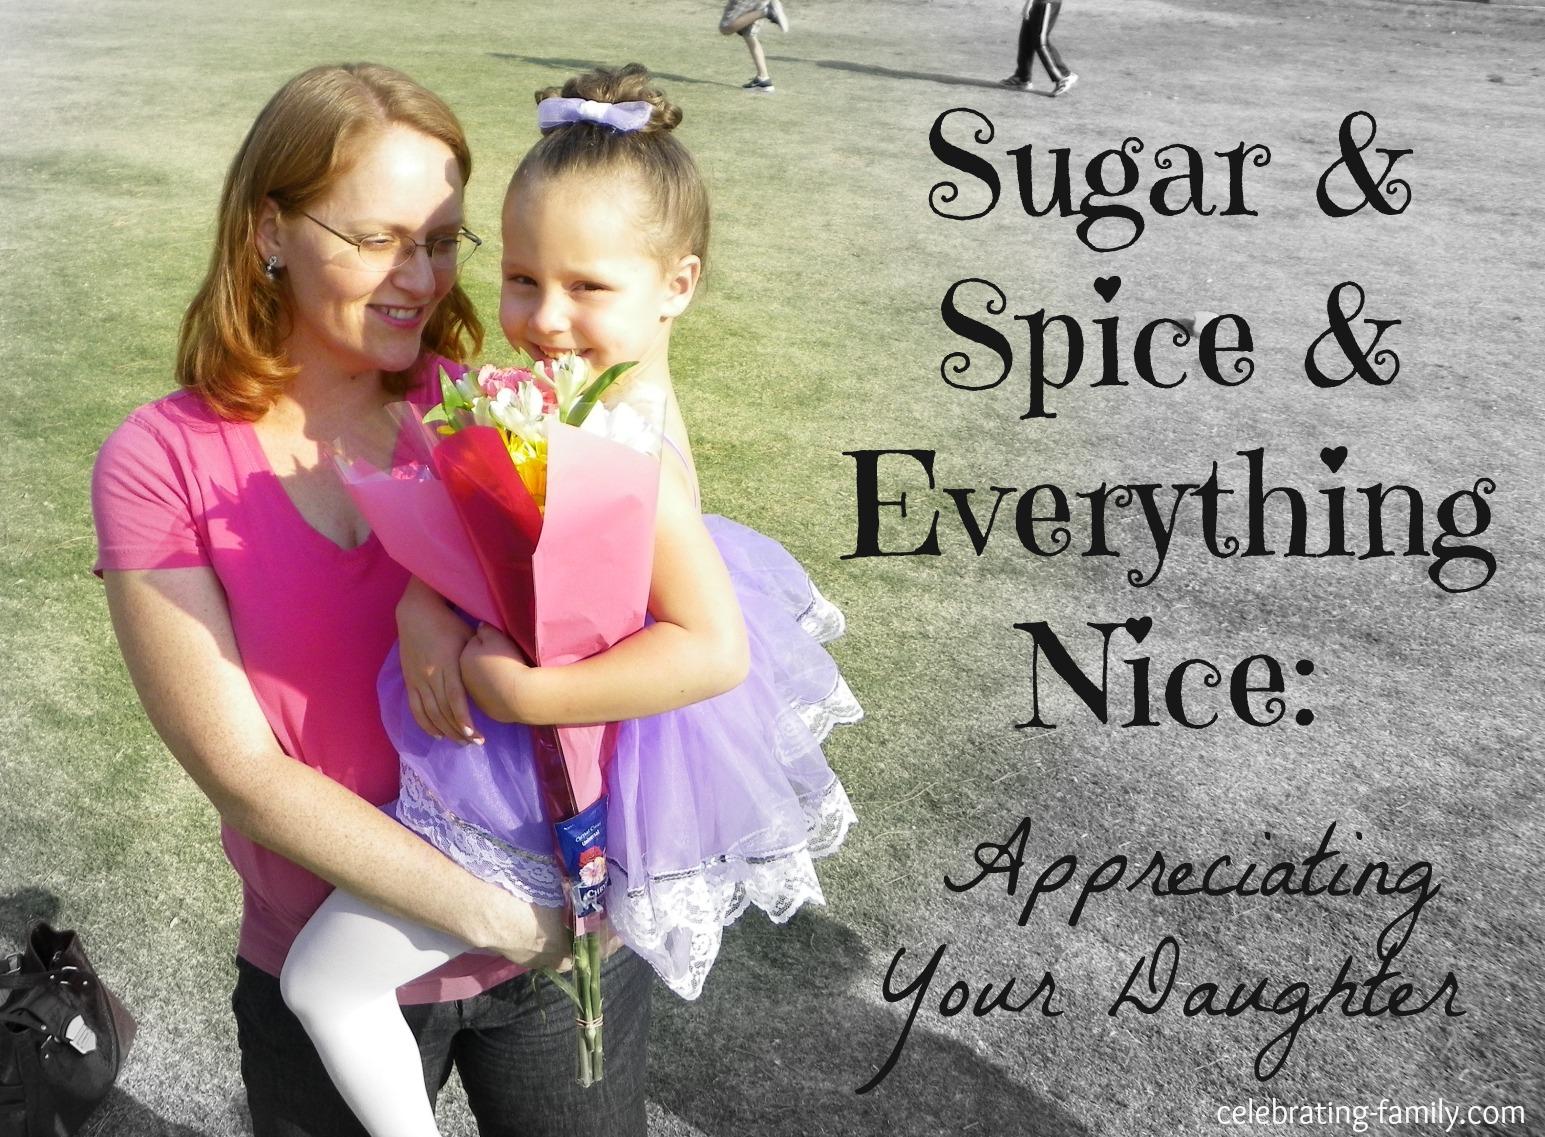 Appreciating Your Daughter